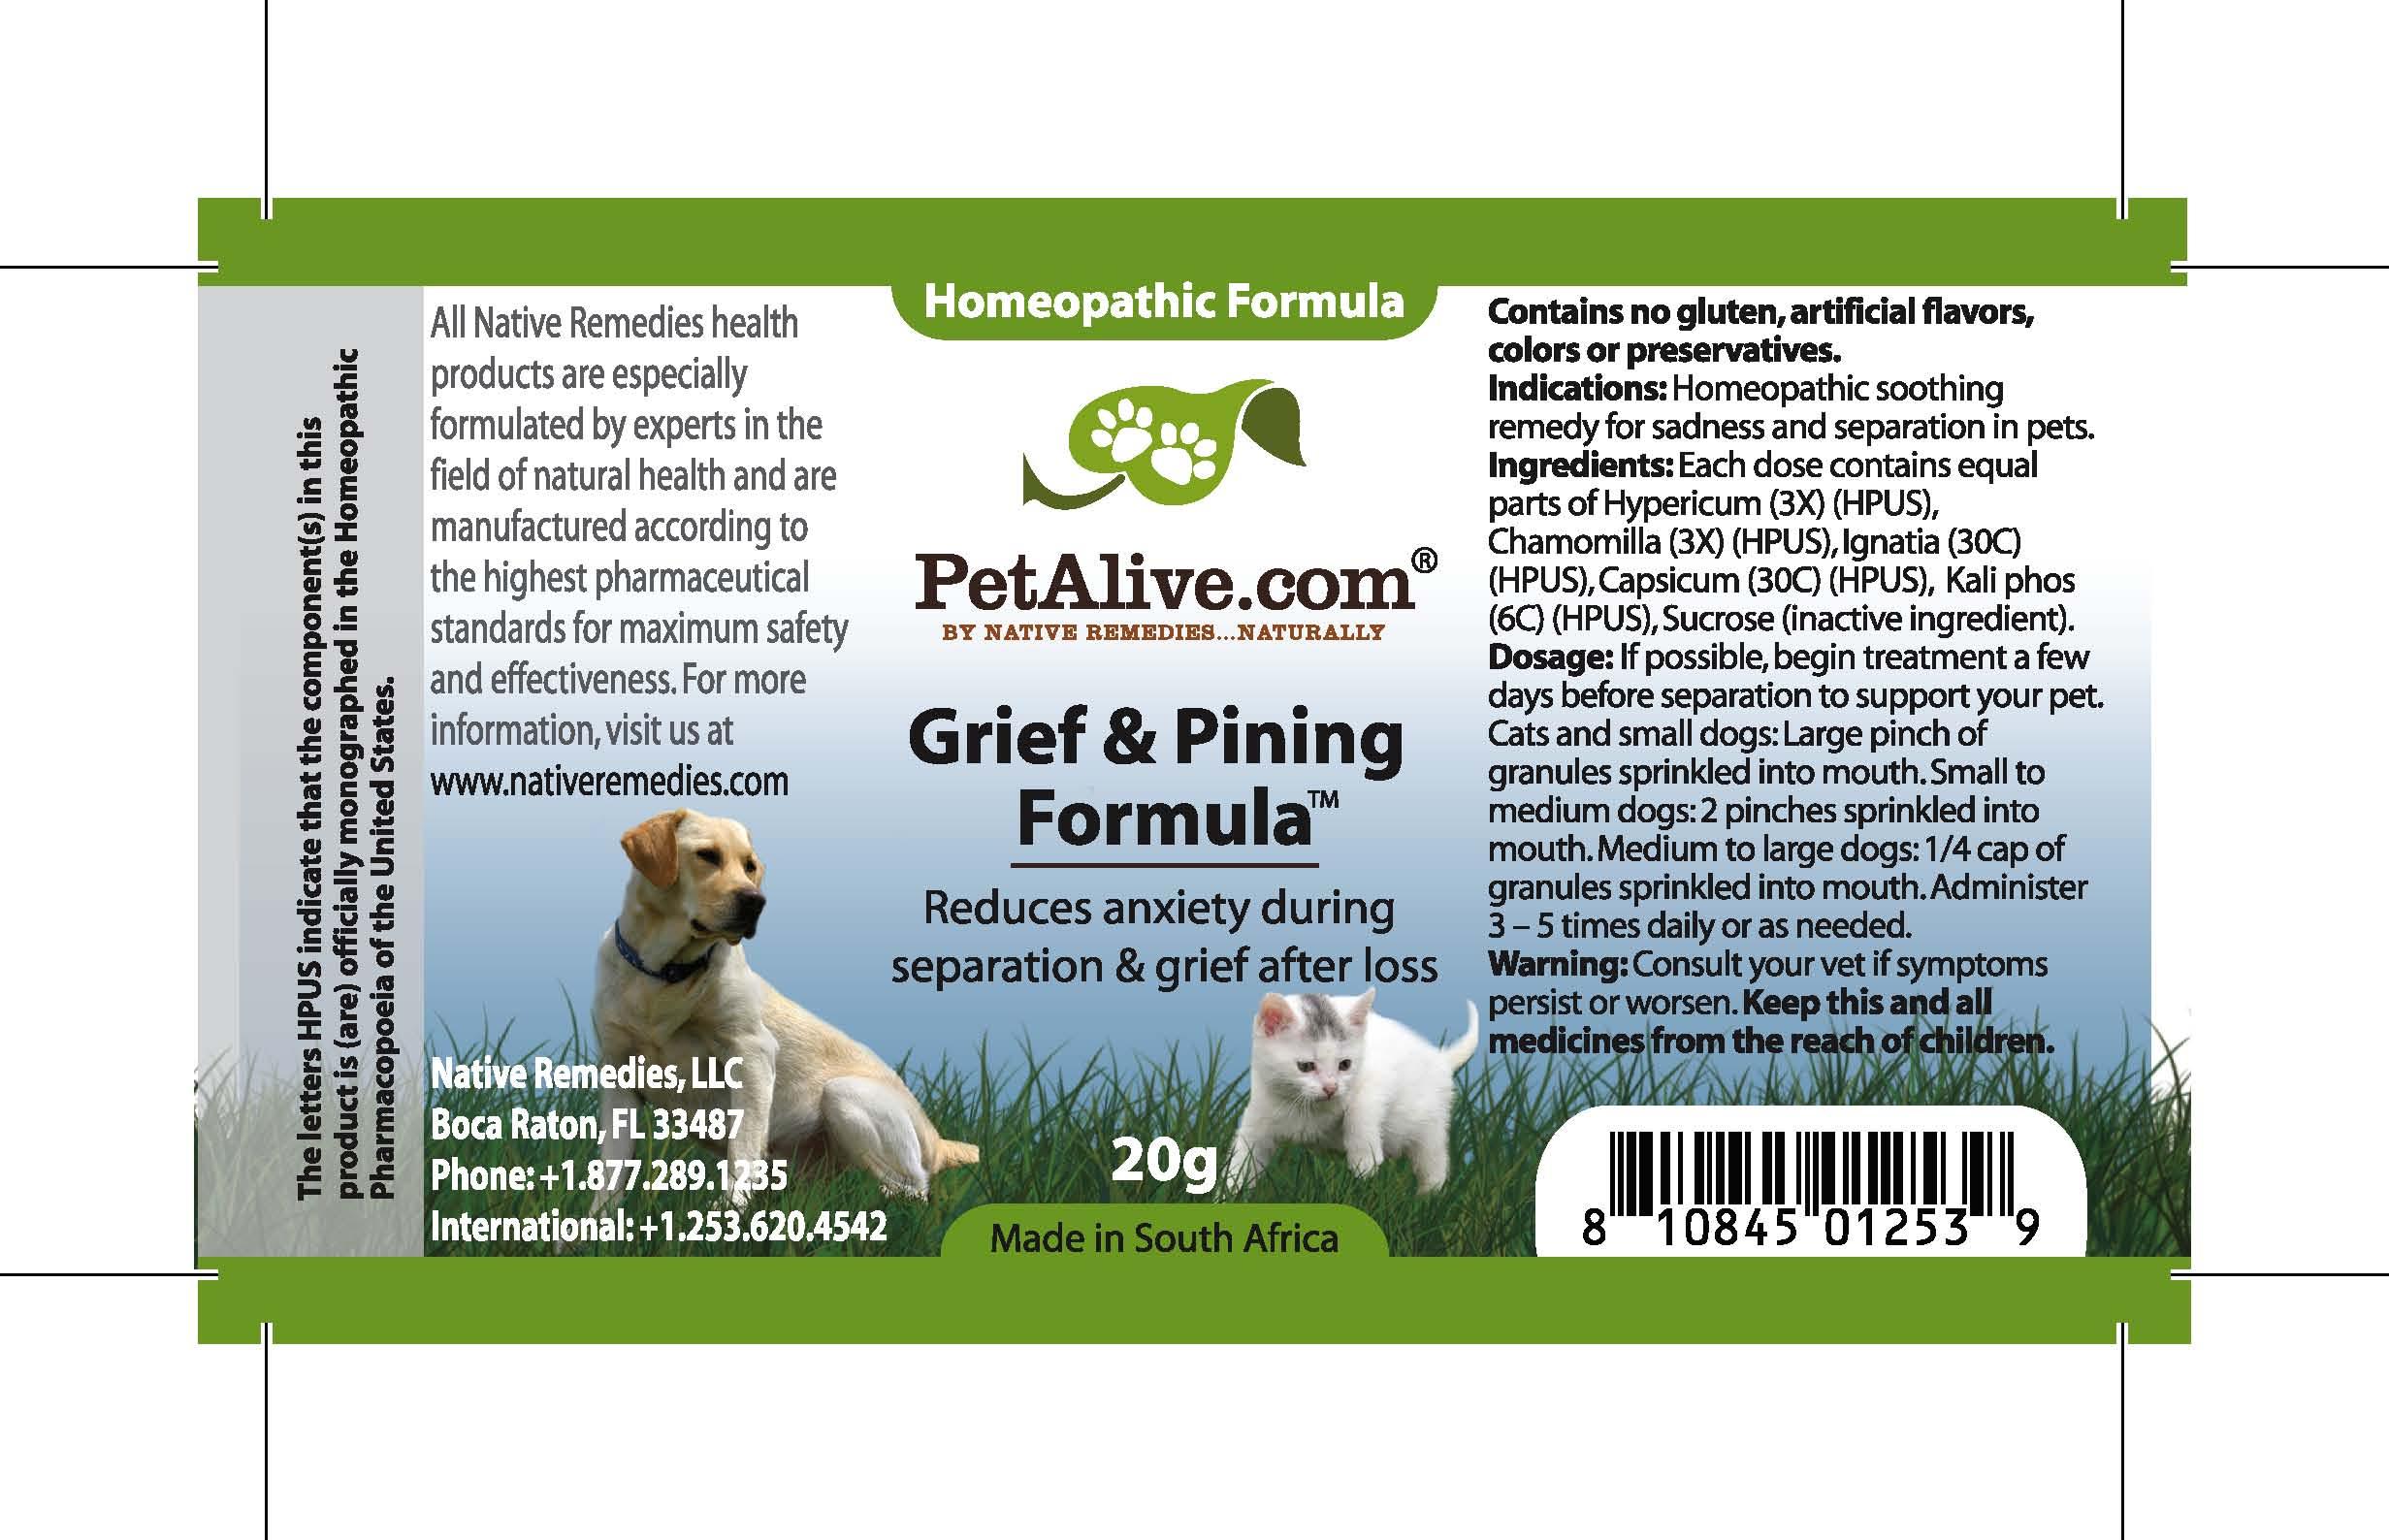 Grief And Pining Formula (Hypericum, Chamomilla, Ignatia, Capsicum, Kali Phos) Granule [Feelgood Health]